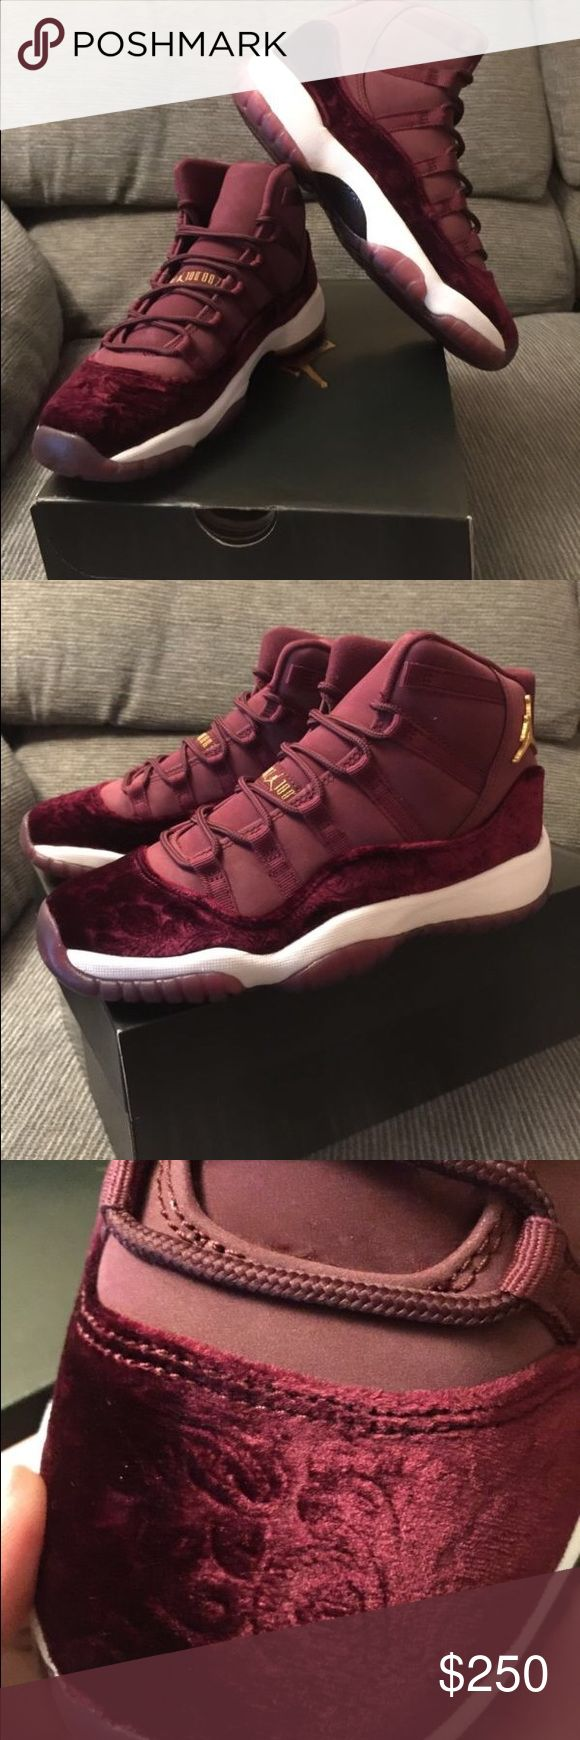 Nike Air Jordan 11 XI Retro Velvet Heiress Maroon Brand New Offers Welcome Send number If you want to buy Jordan Shoes Sneakers